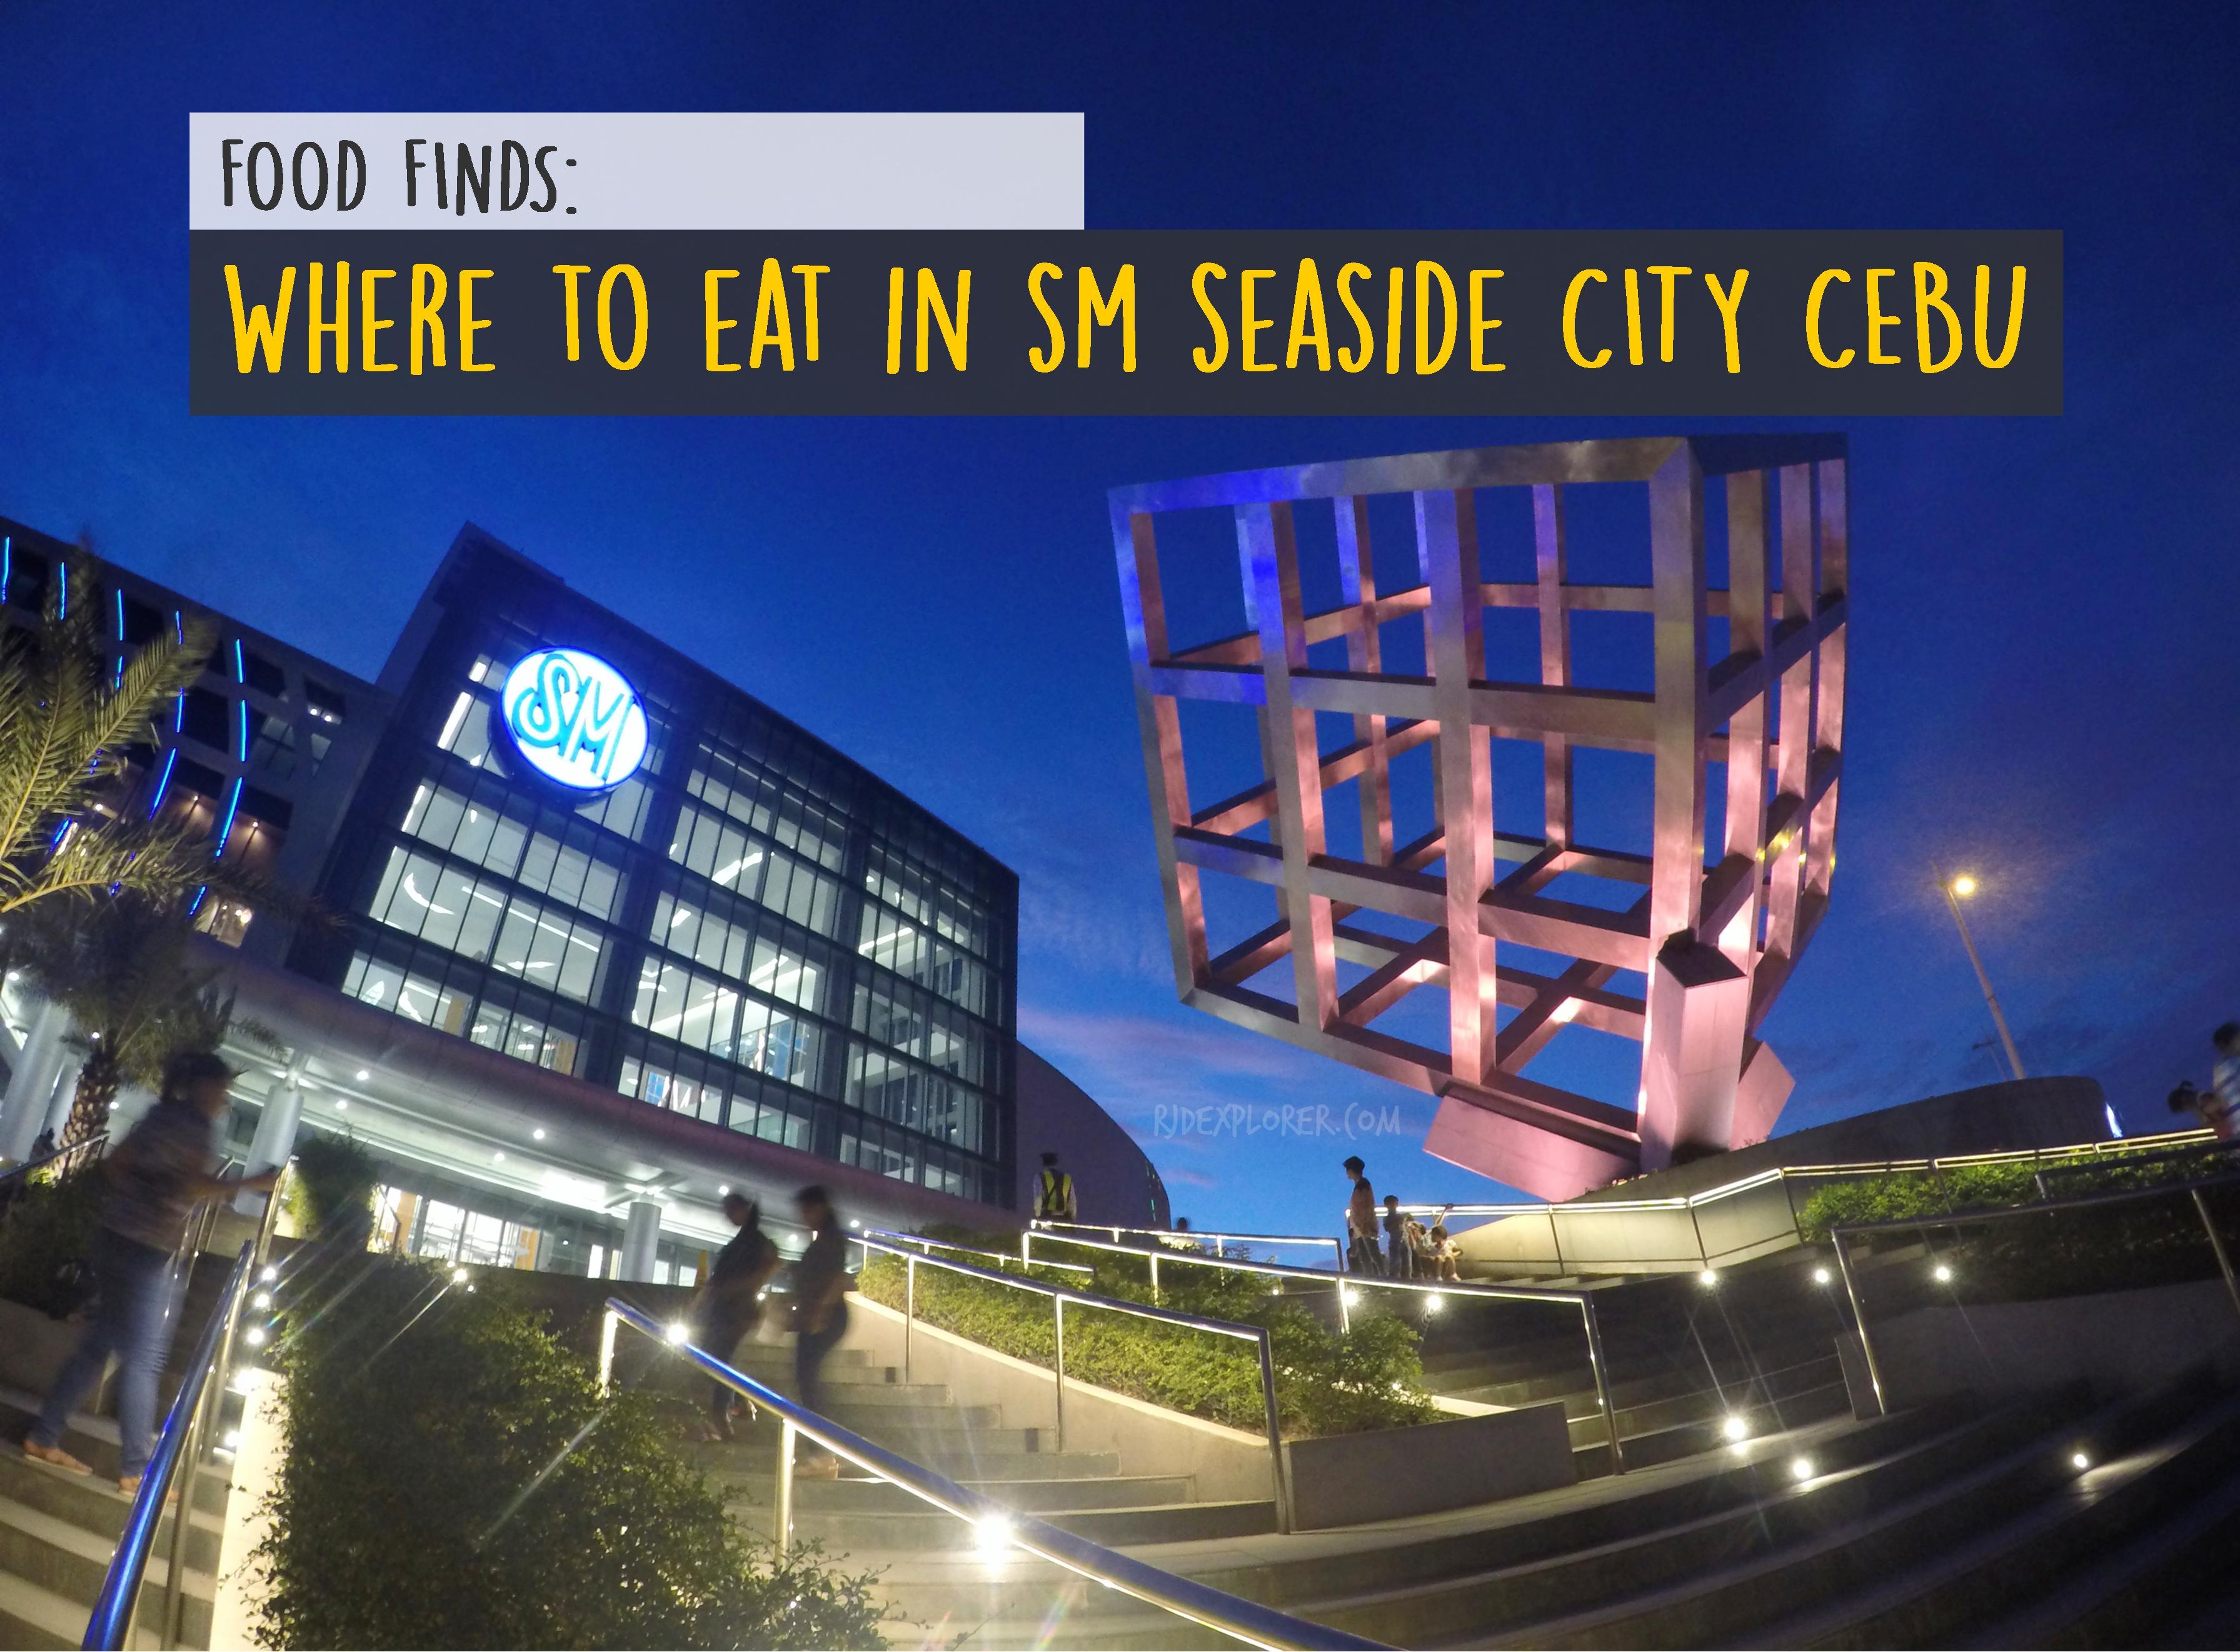 Where To Eat In Cebu Sm Seaside City Cebu Iwander Iexperience Ikwento